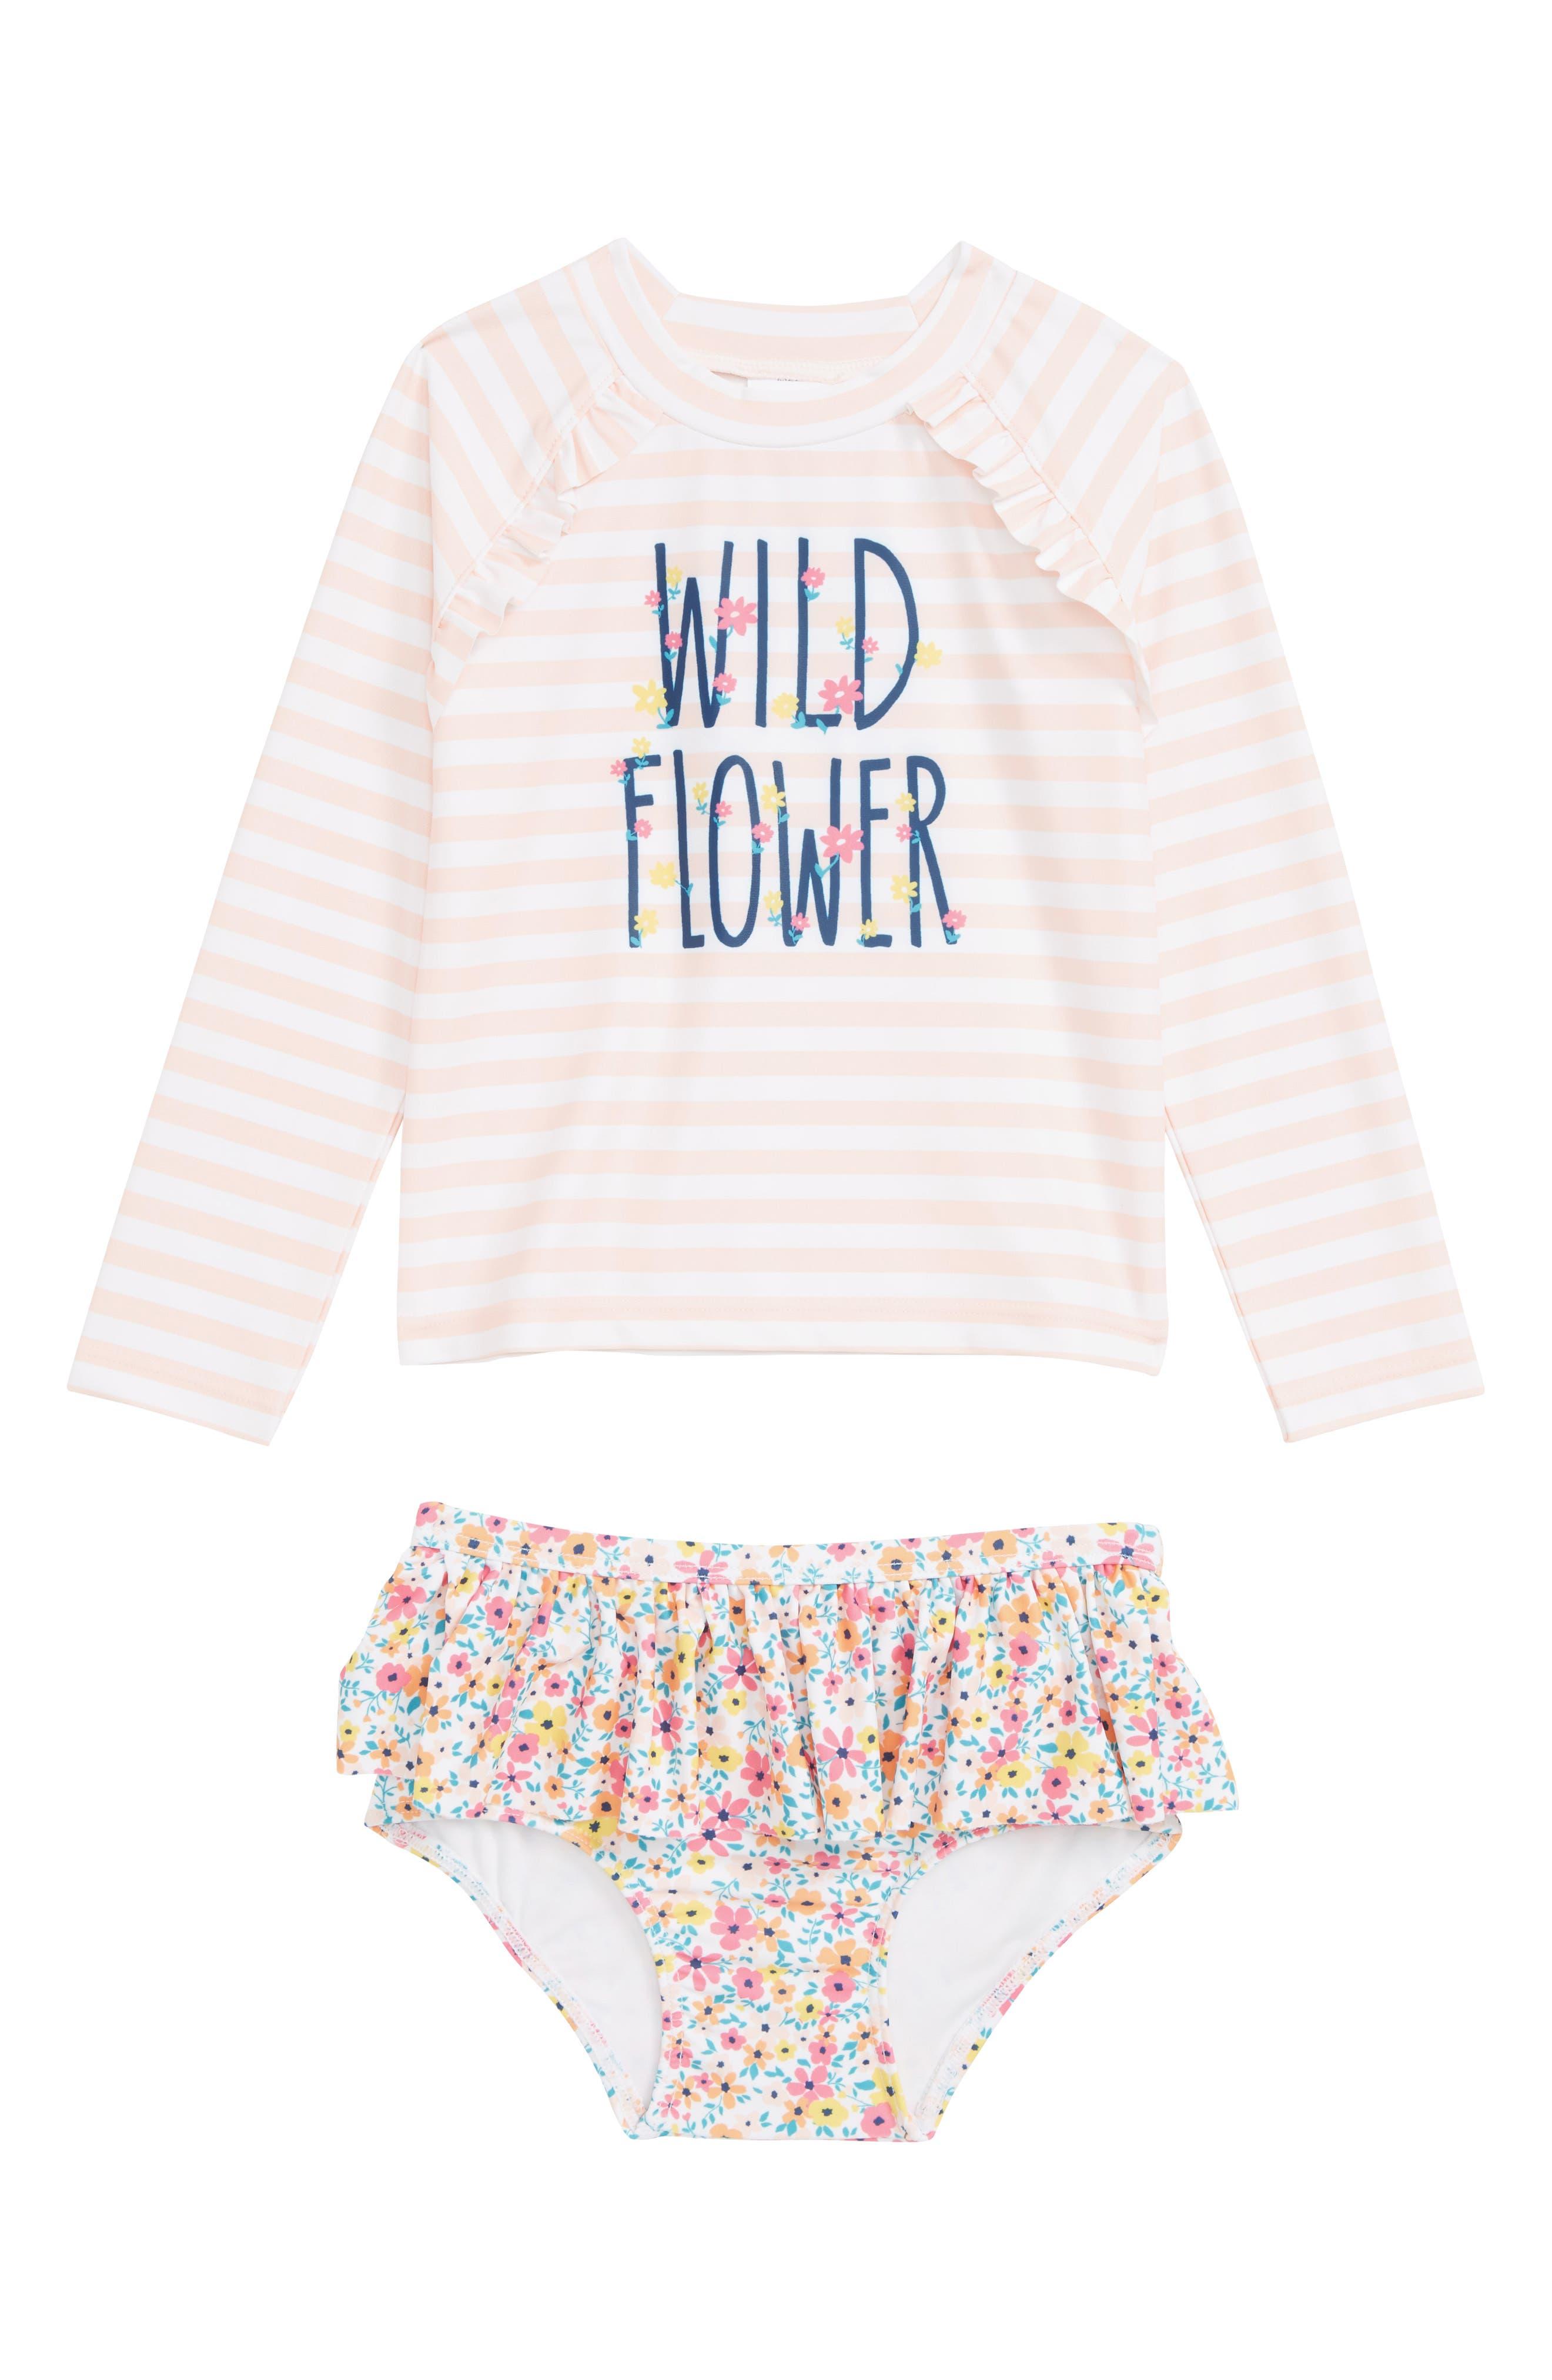 5d55ea6017 Infant Girl's Tucker + Tate Two-Piece Ruffle Rashguard Swimsuit